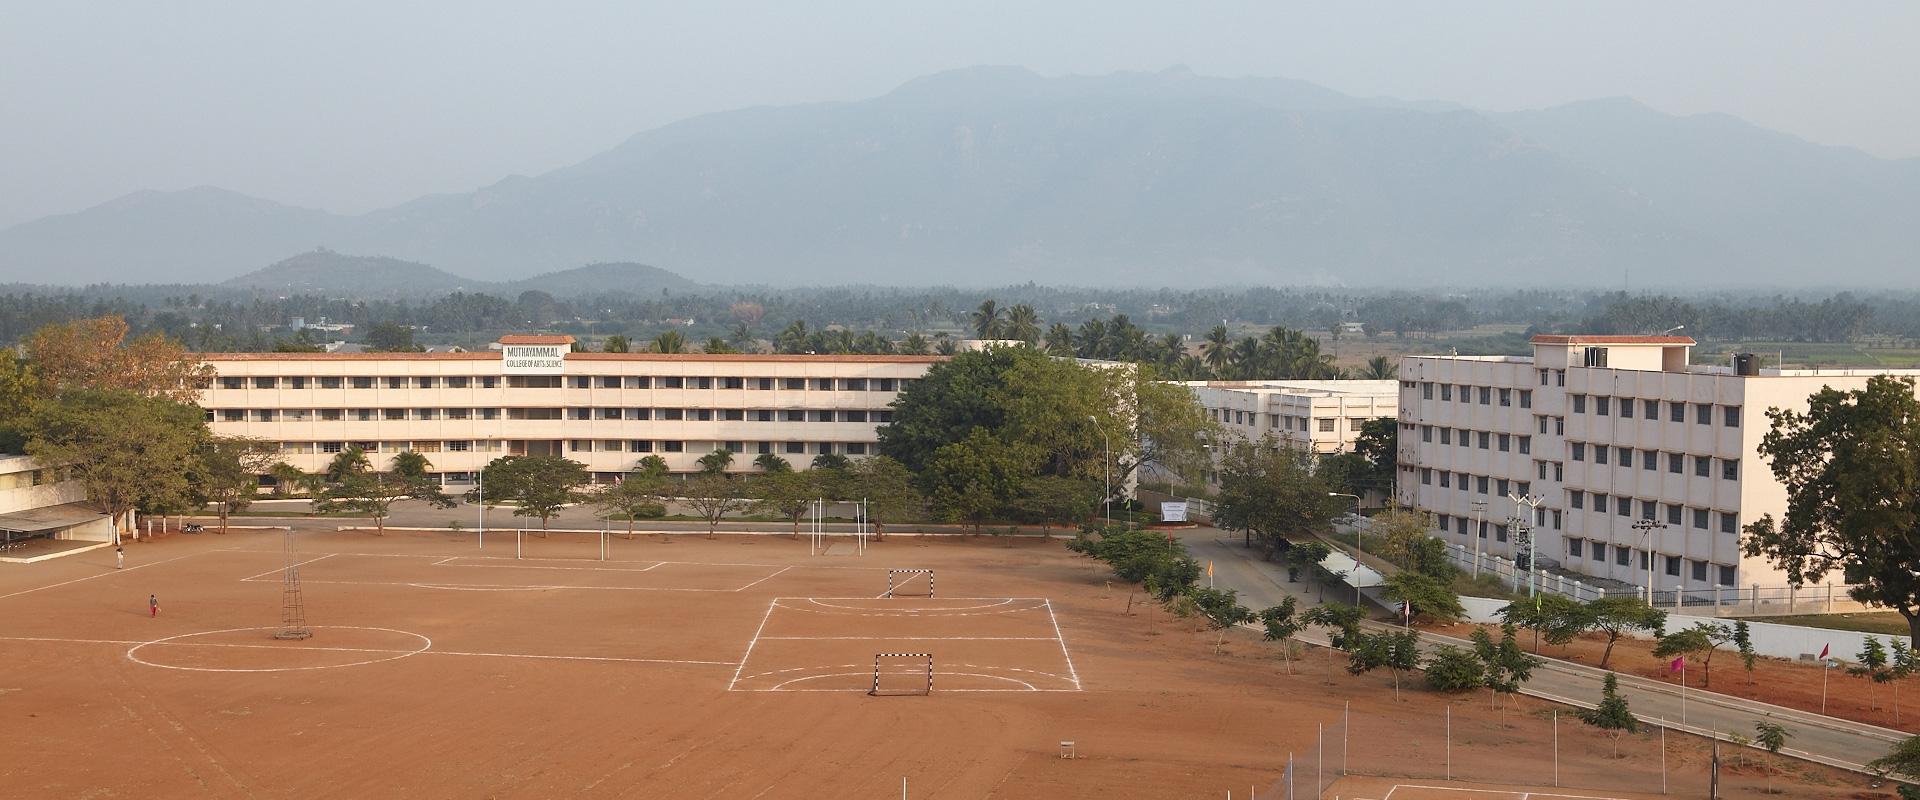 Muthayammal College of Arts and Science, Rasipuram Image